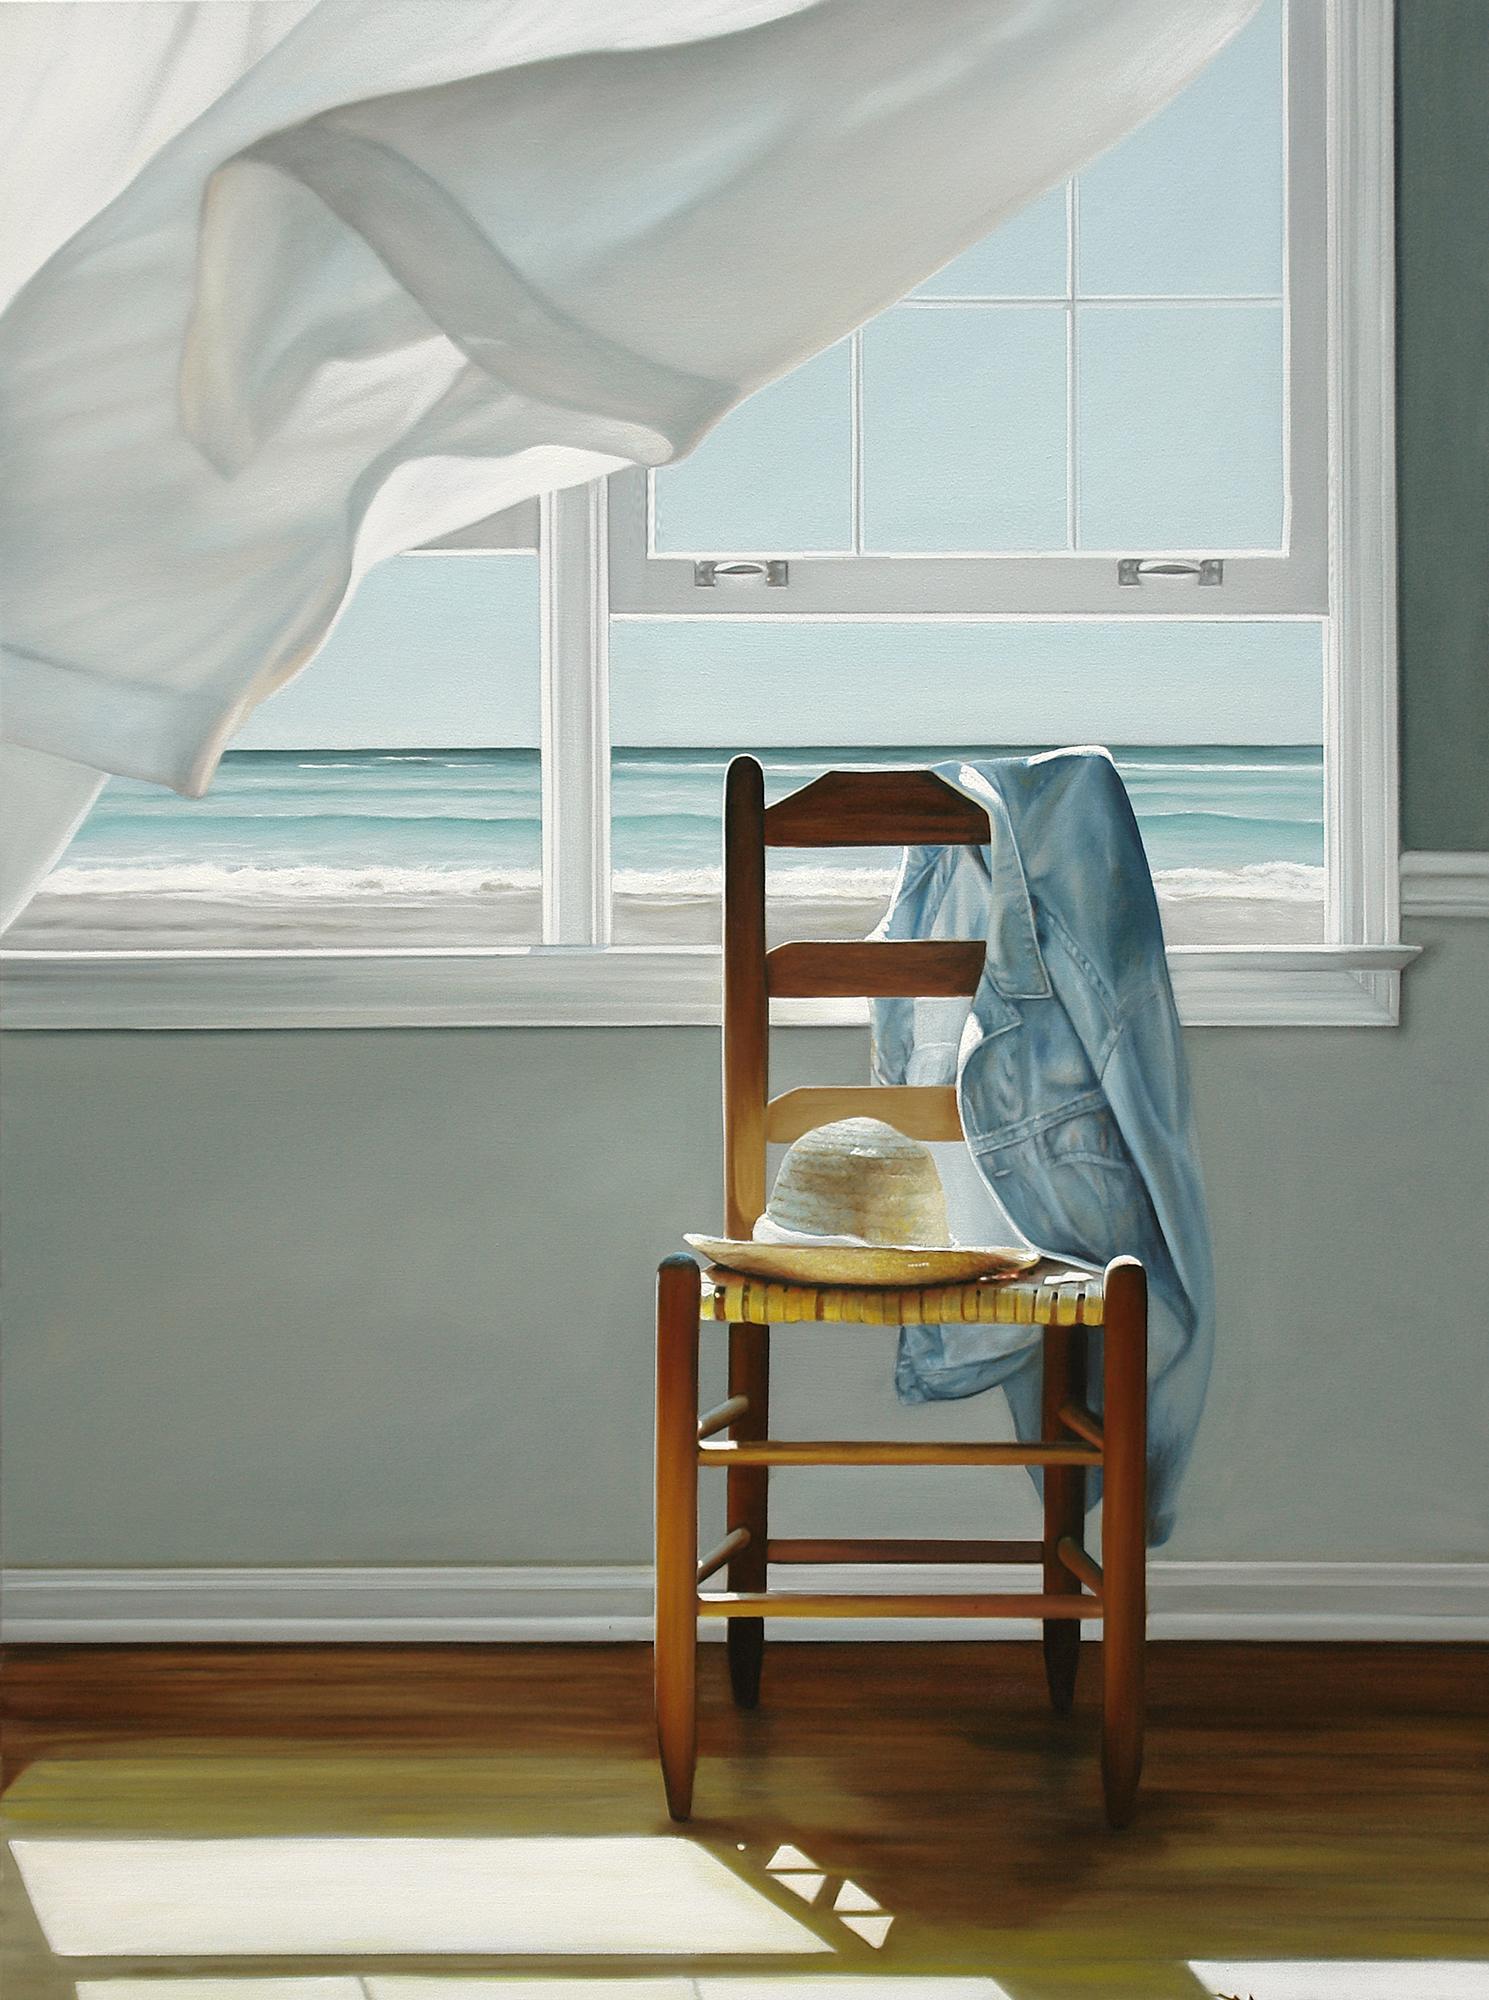 Deep Breathing | 36 x 48 | Oil on canvas